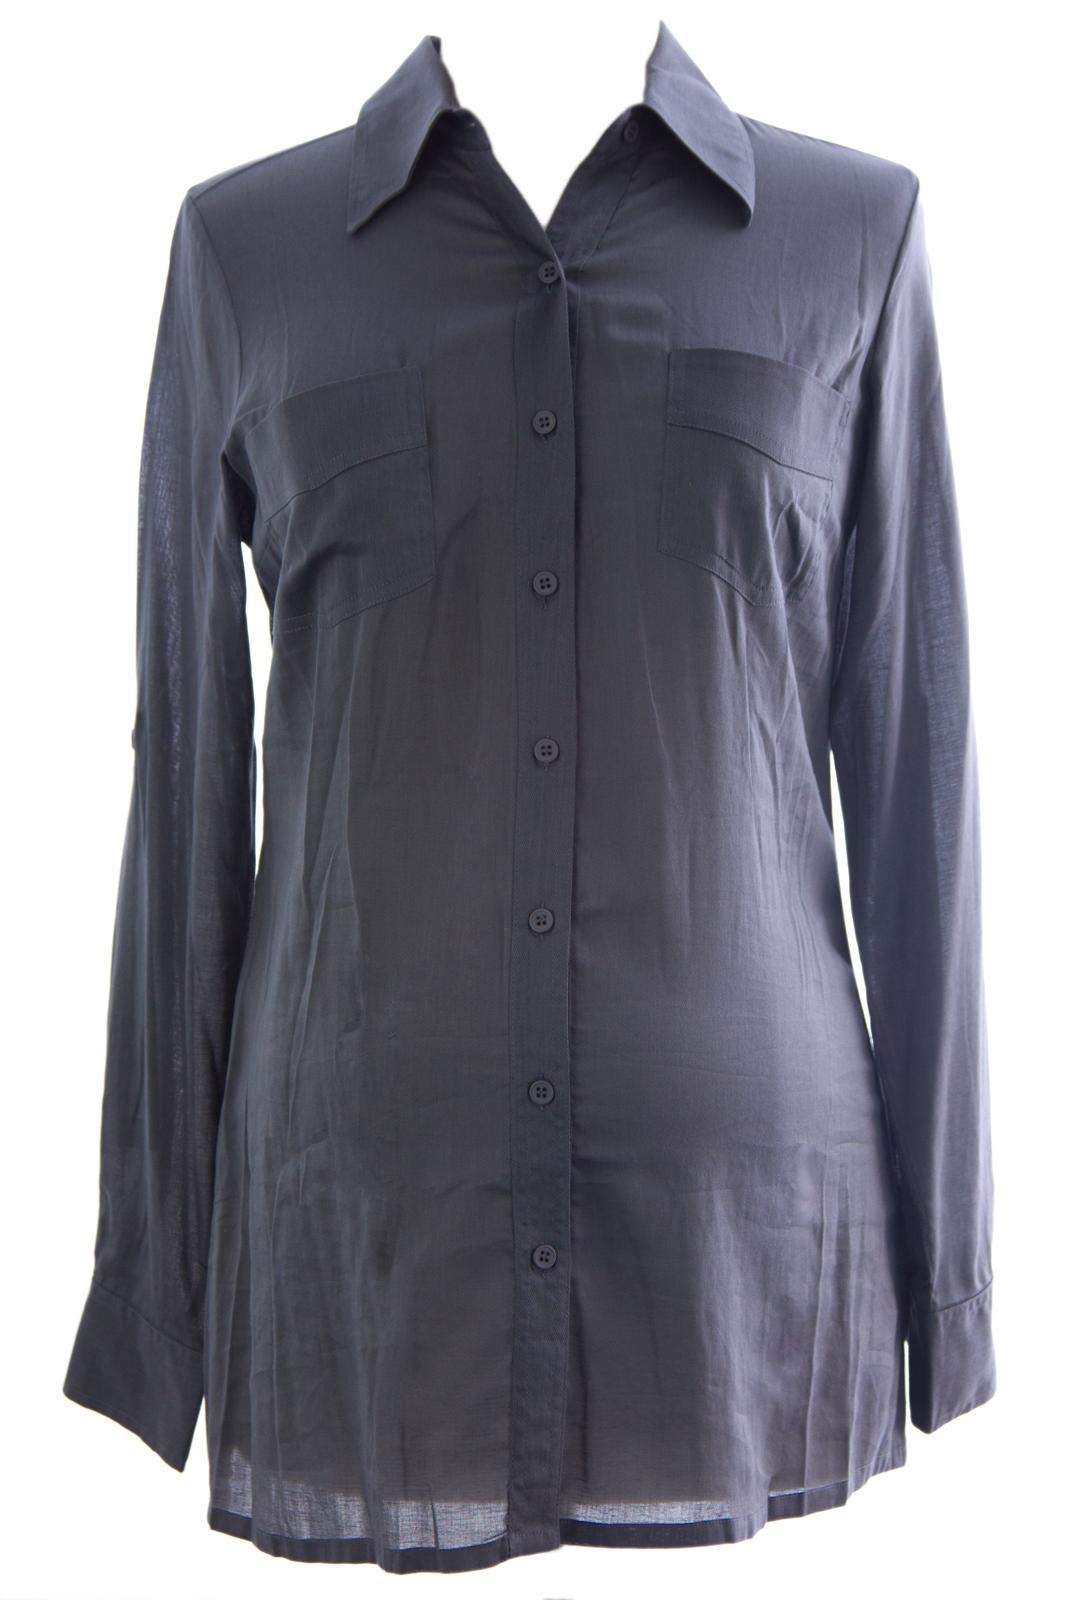 OLIAN Maternity Women's Button Down Cotton Blouse Sz X-Small Smoke Grey